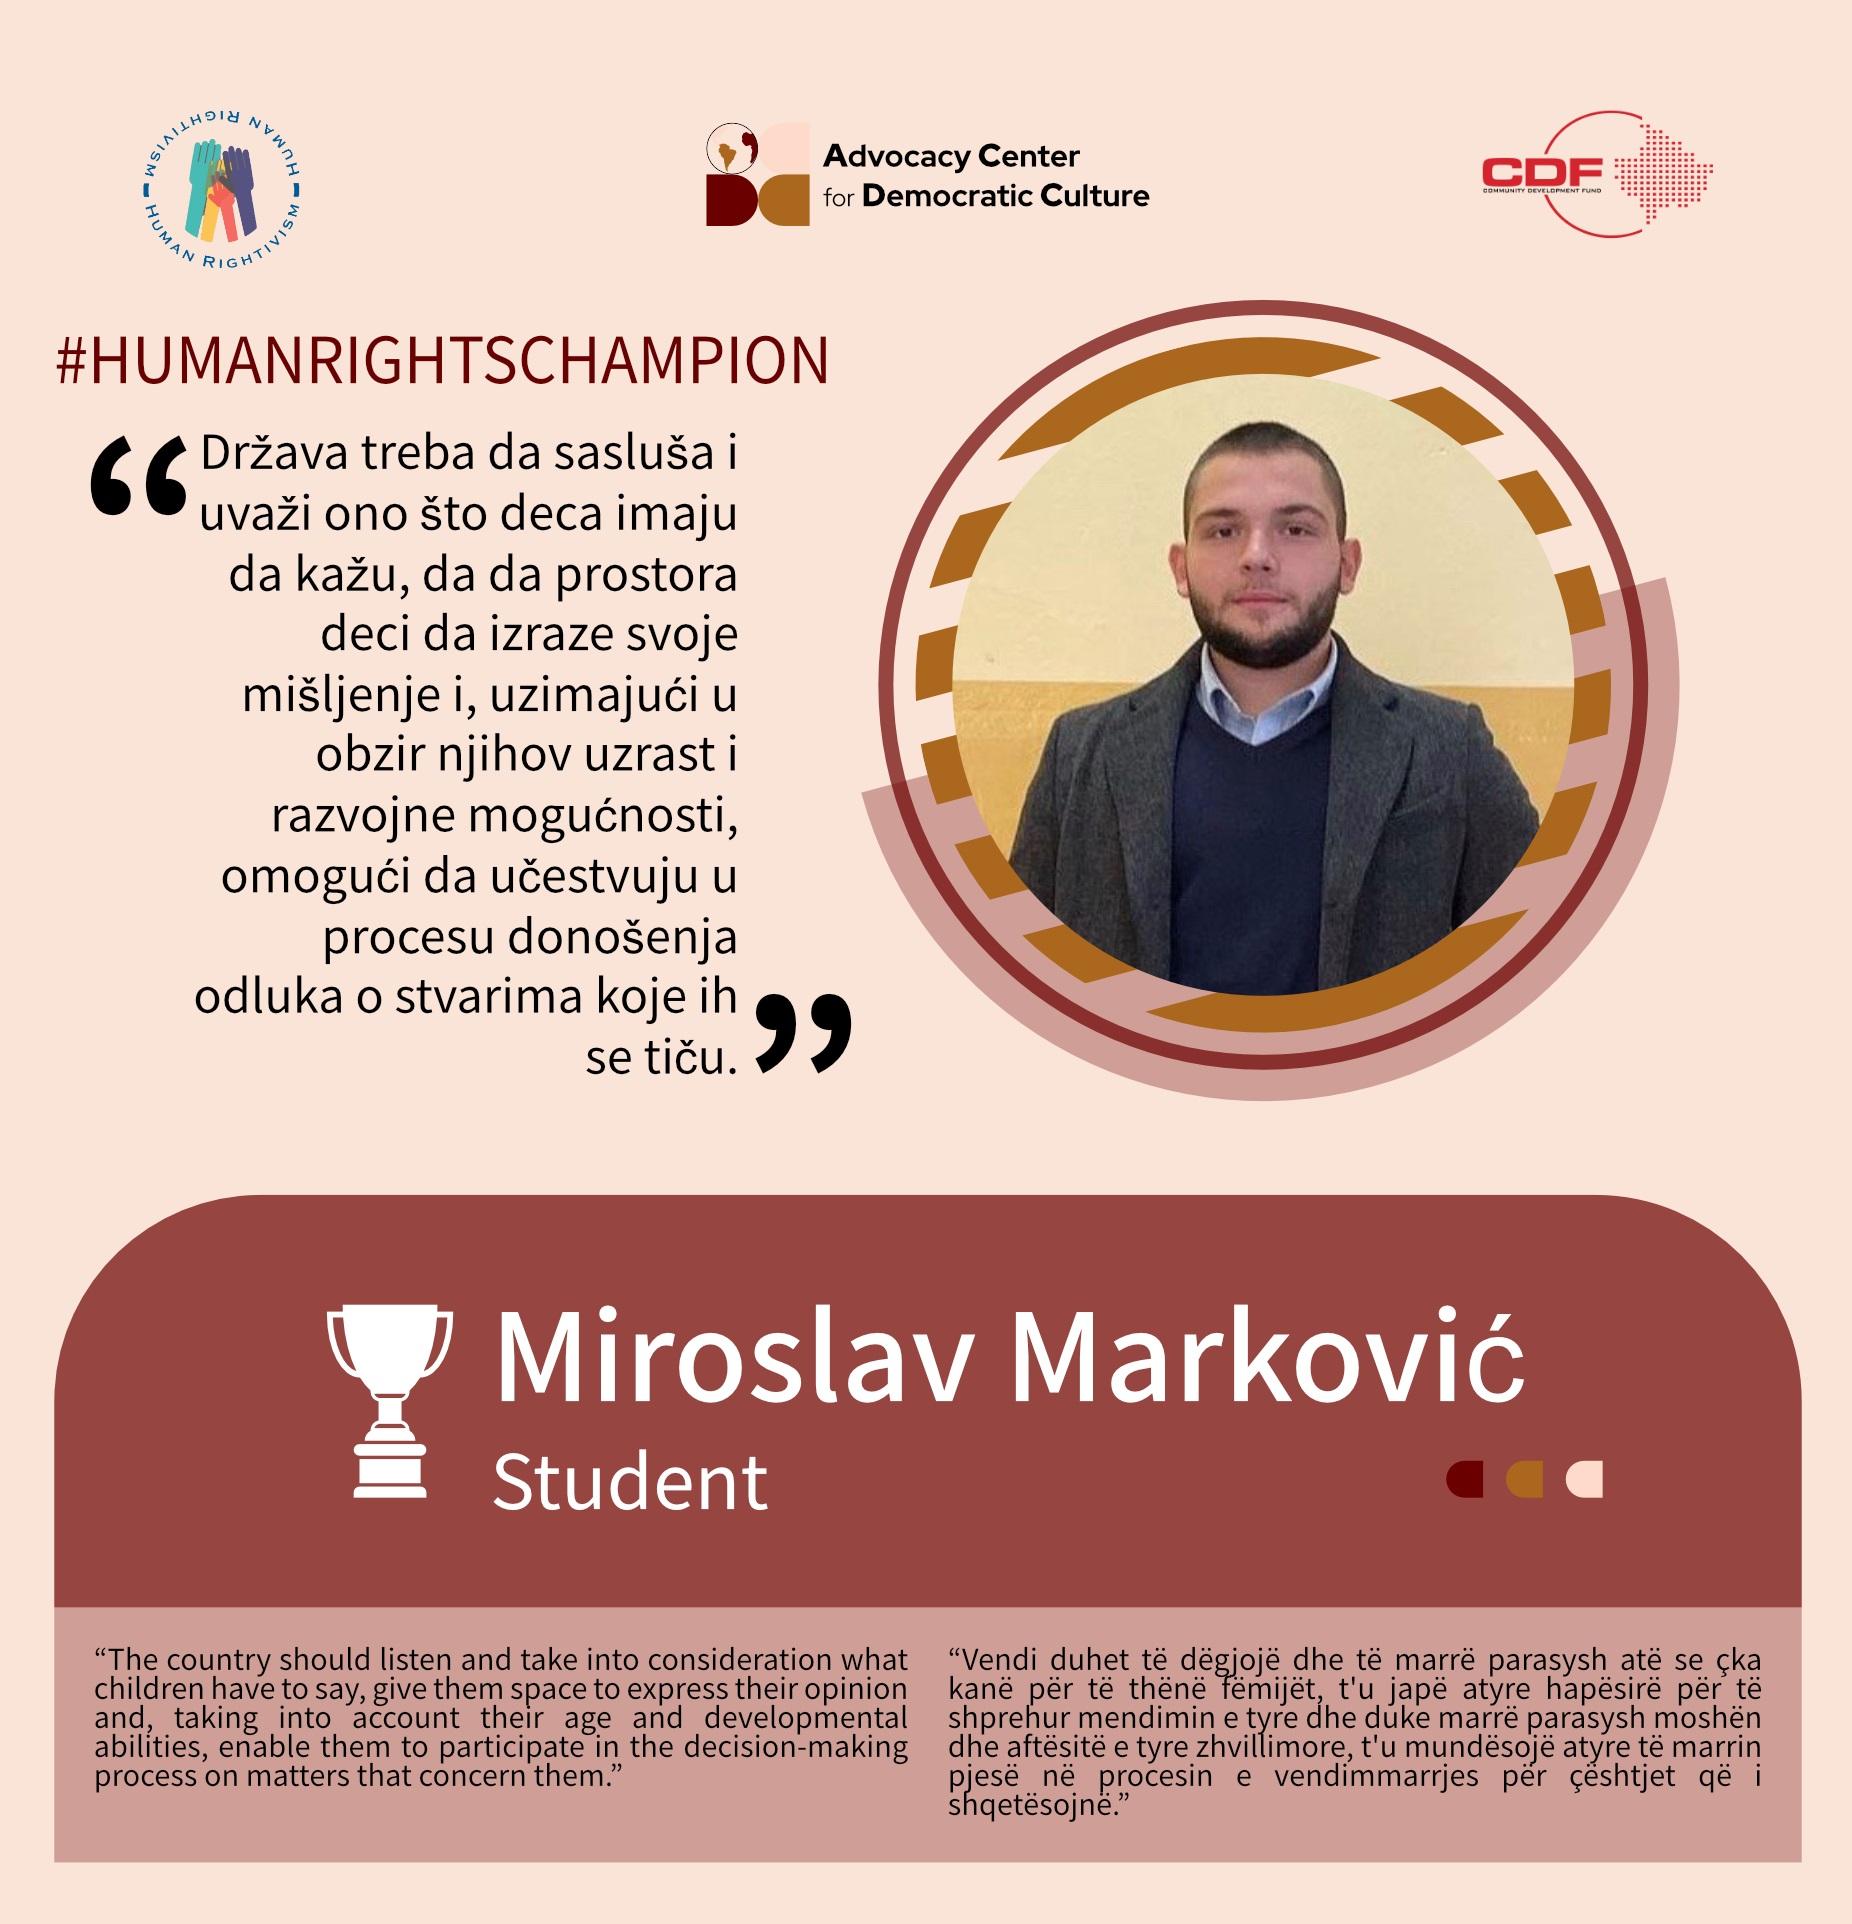 kampanja-promocije-ljudskih-prava-humanrightschampion-miroslav-markovic